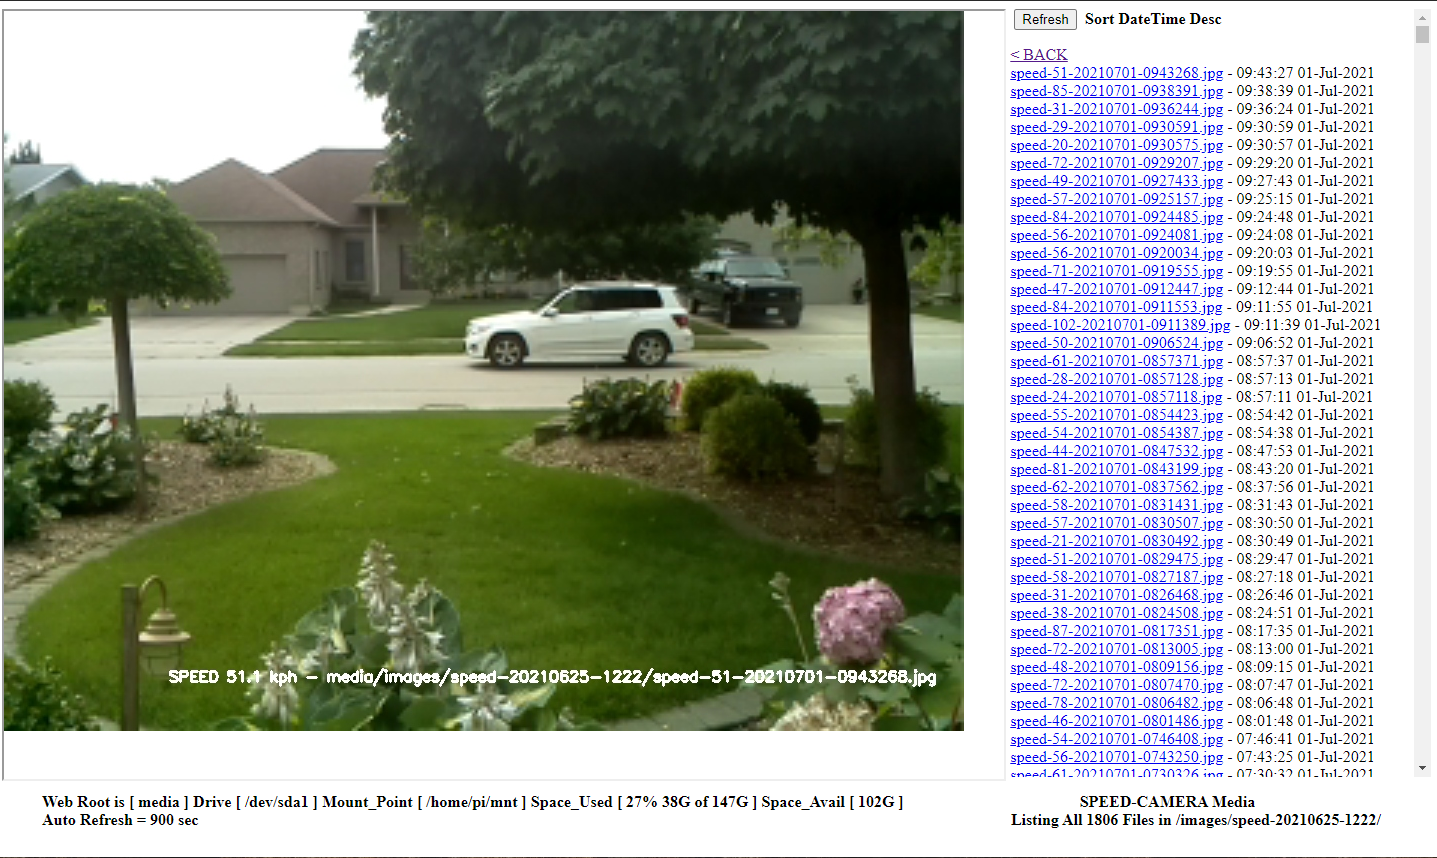 Speed Camera RECENT Folder Web Page